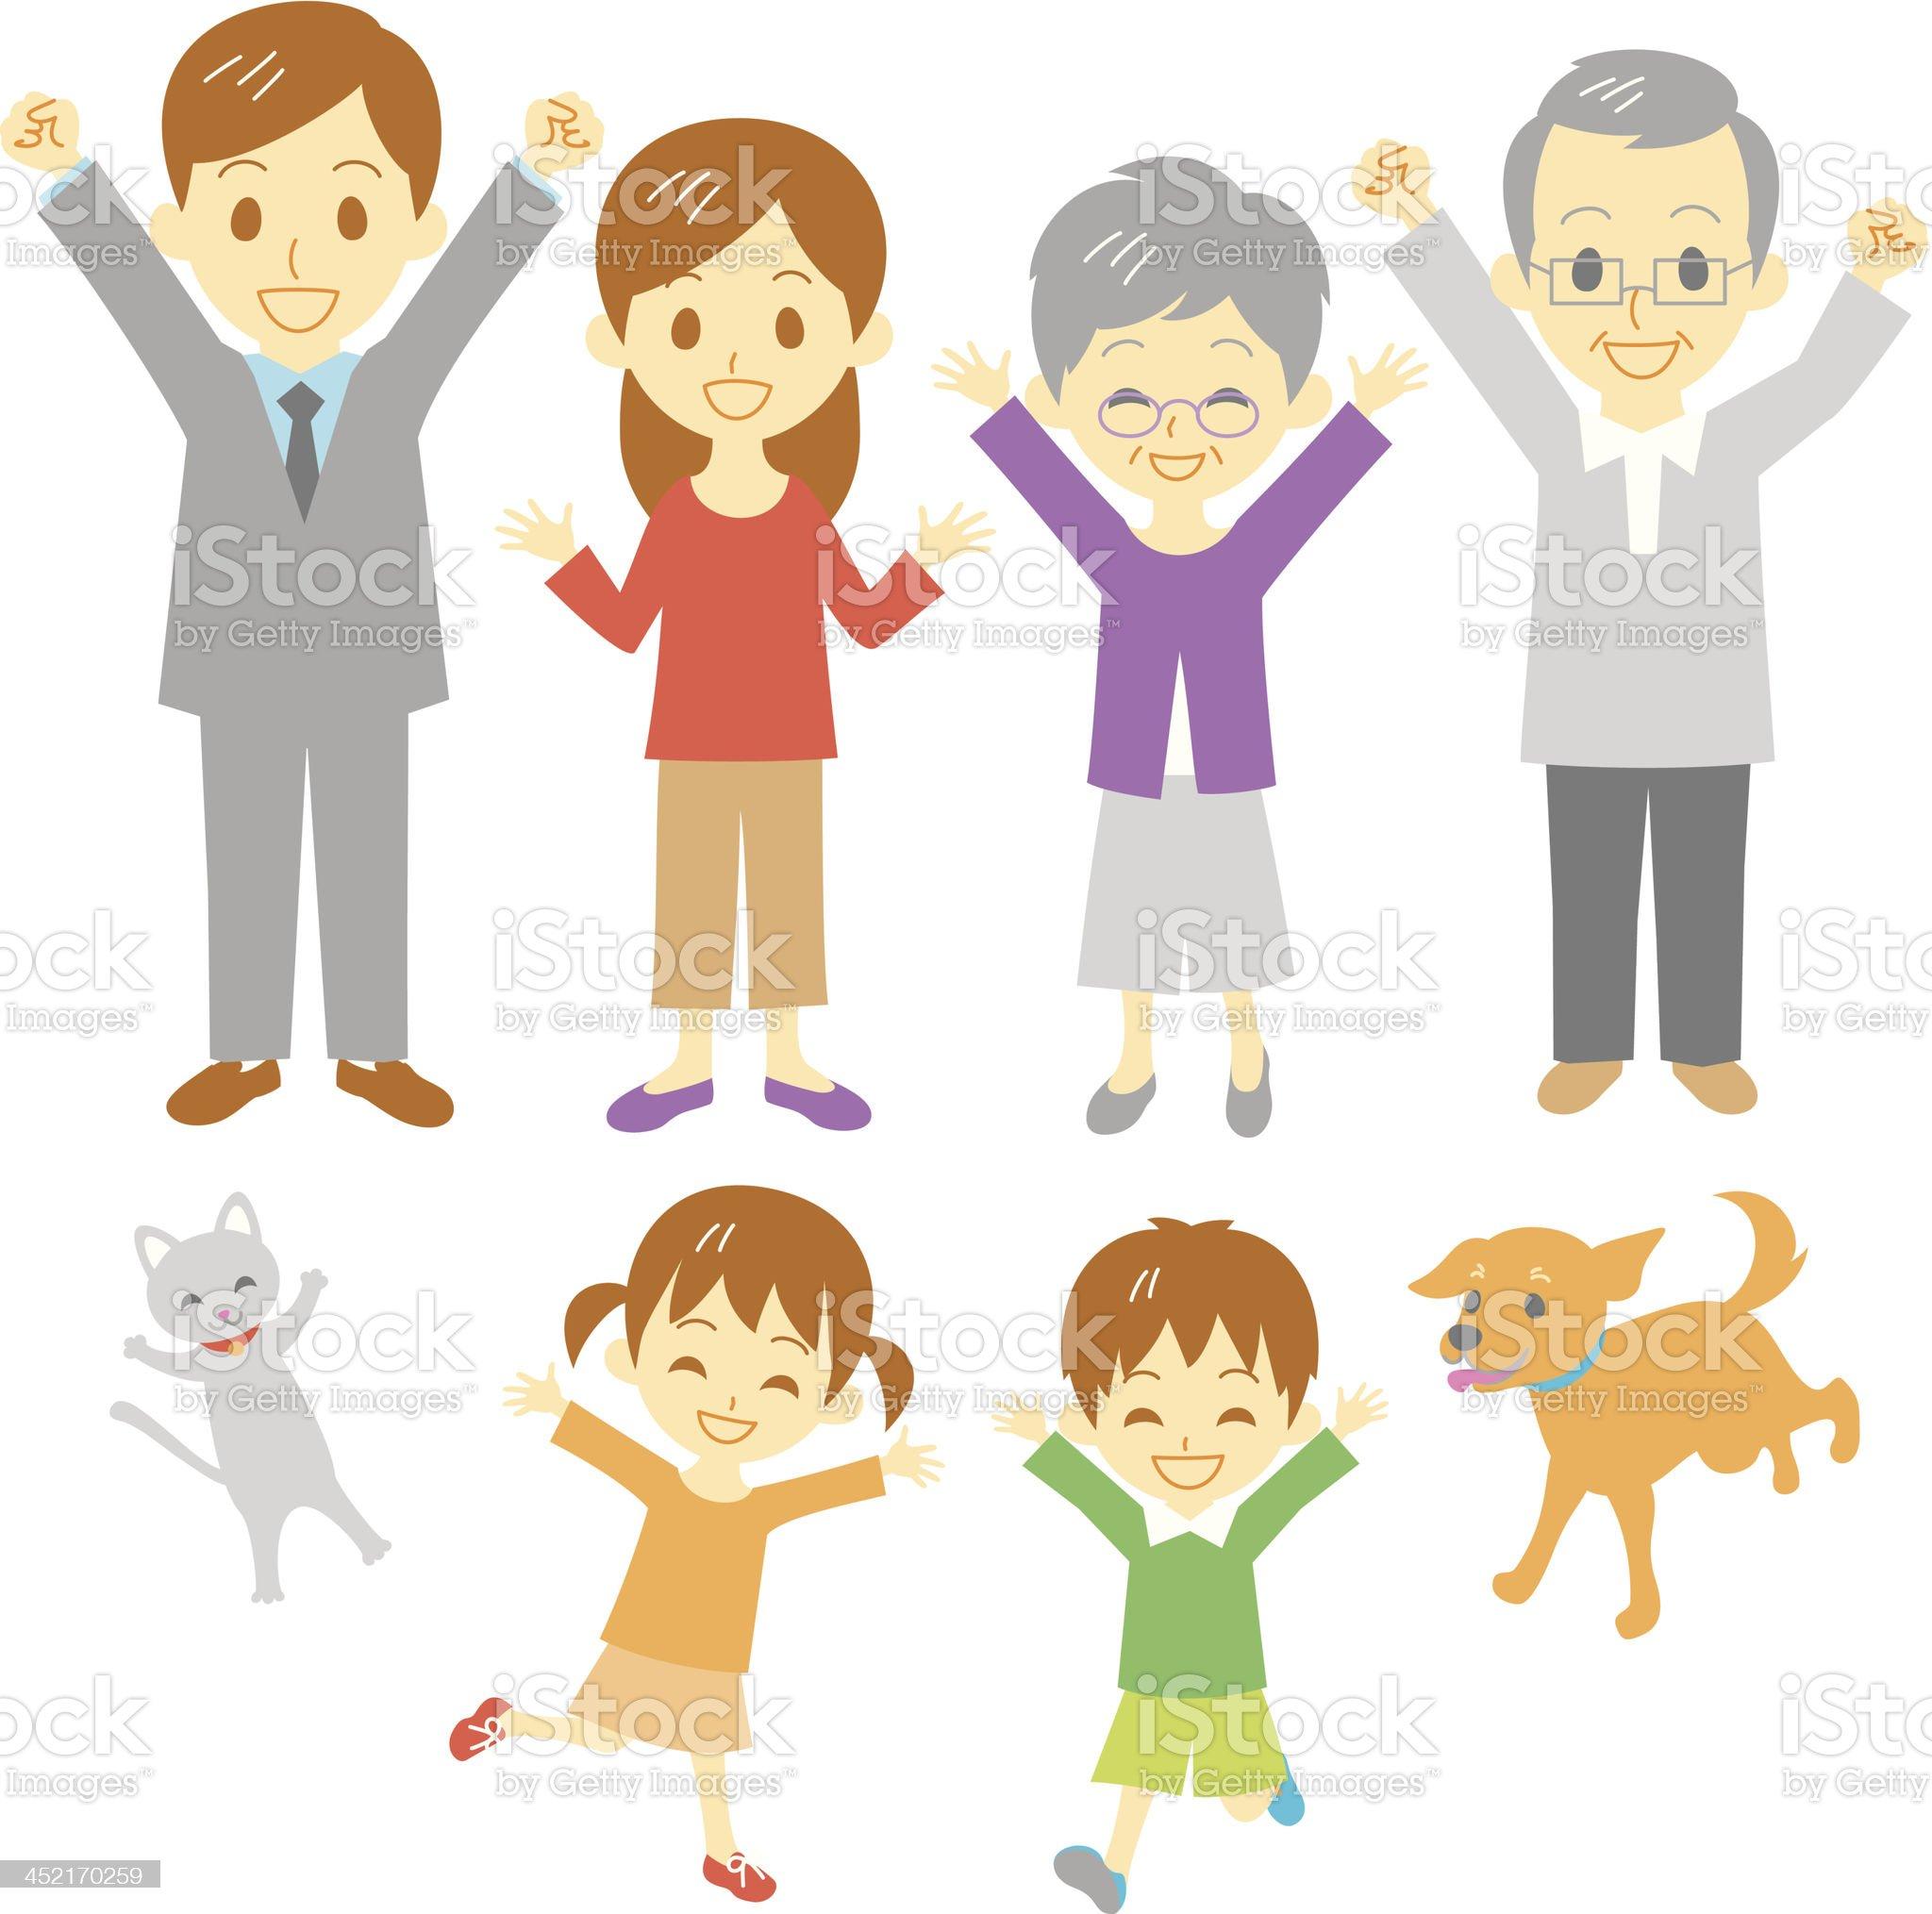 joyful family royalty-free stock vector art